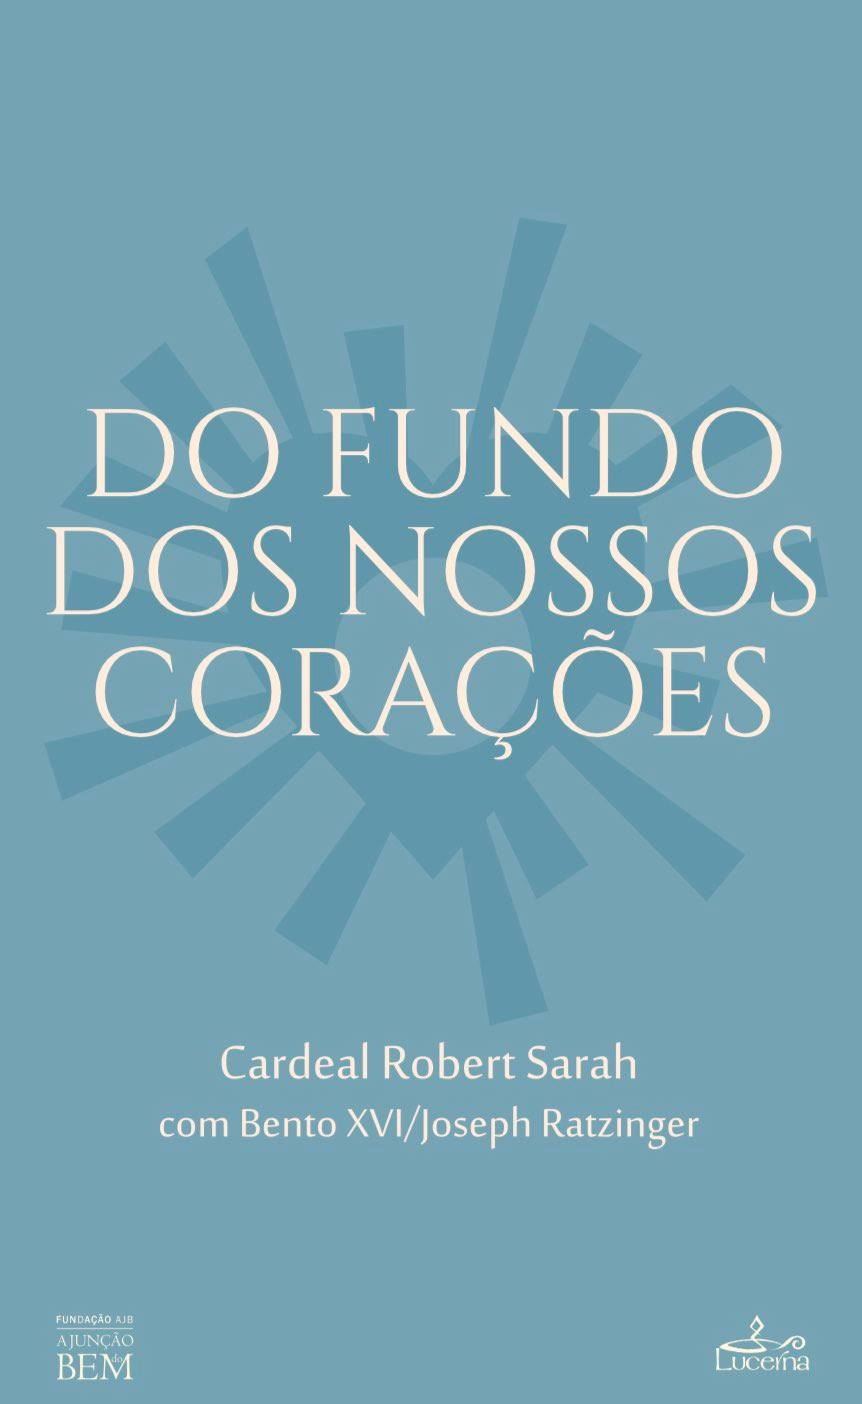 rs_xvib_portugese.jpg